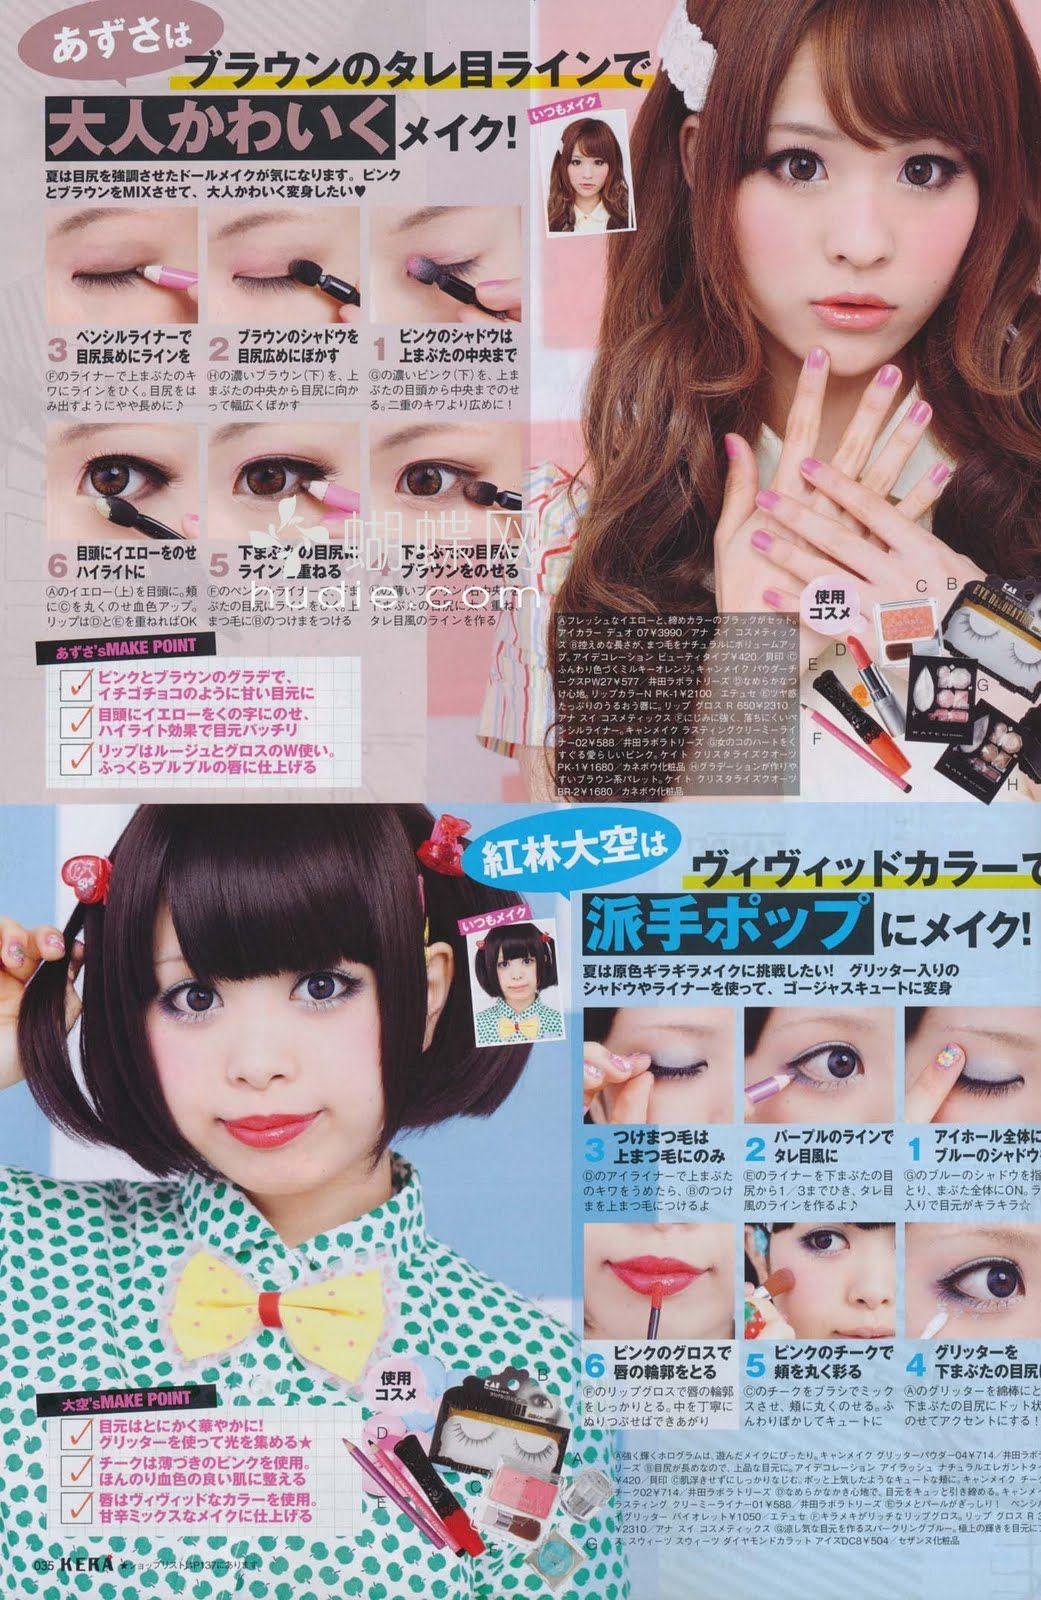 Maquillaje de ojos japonés (The Basics)